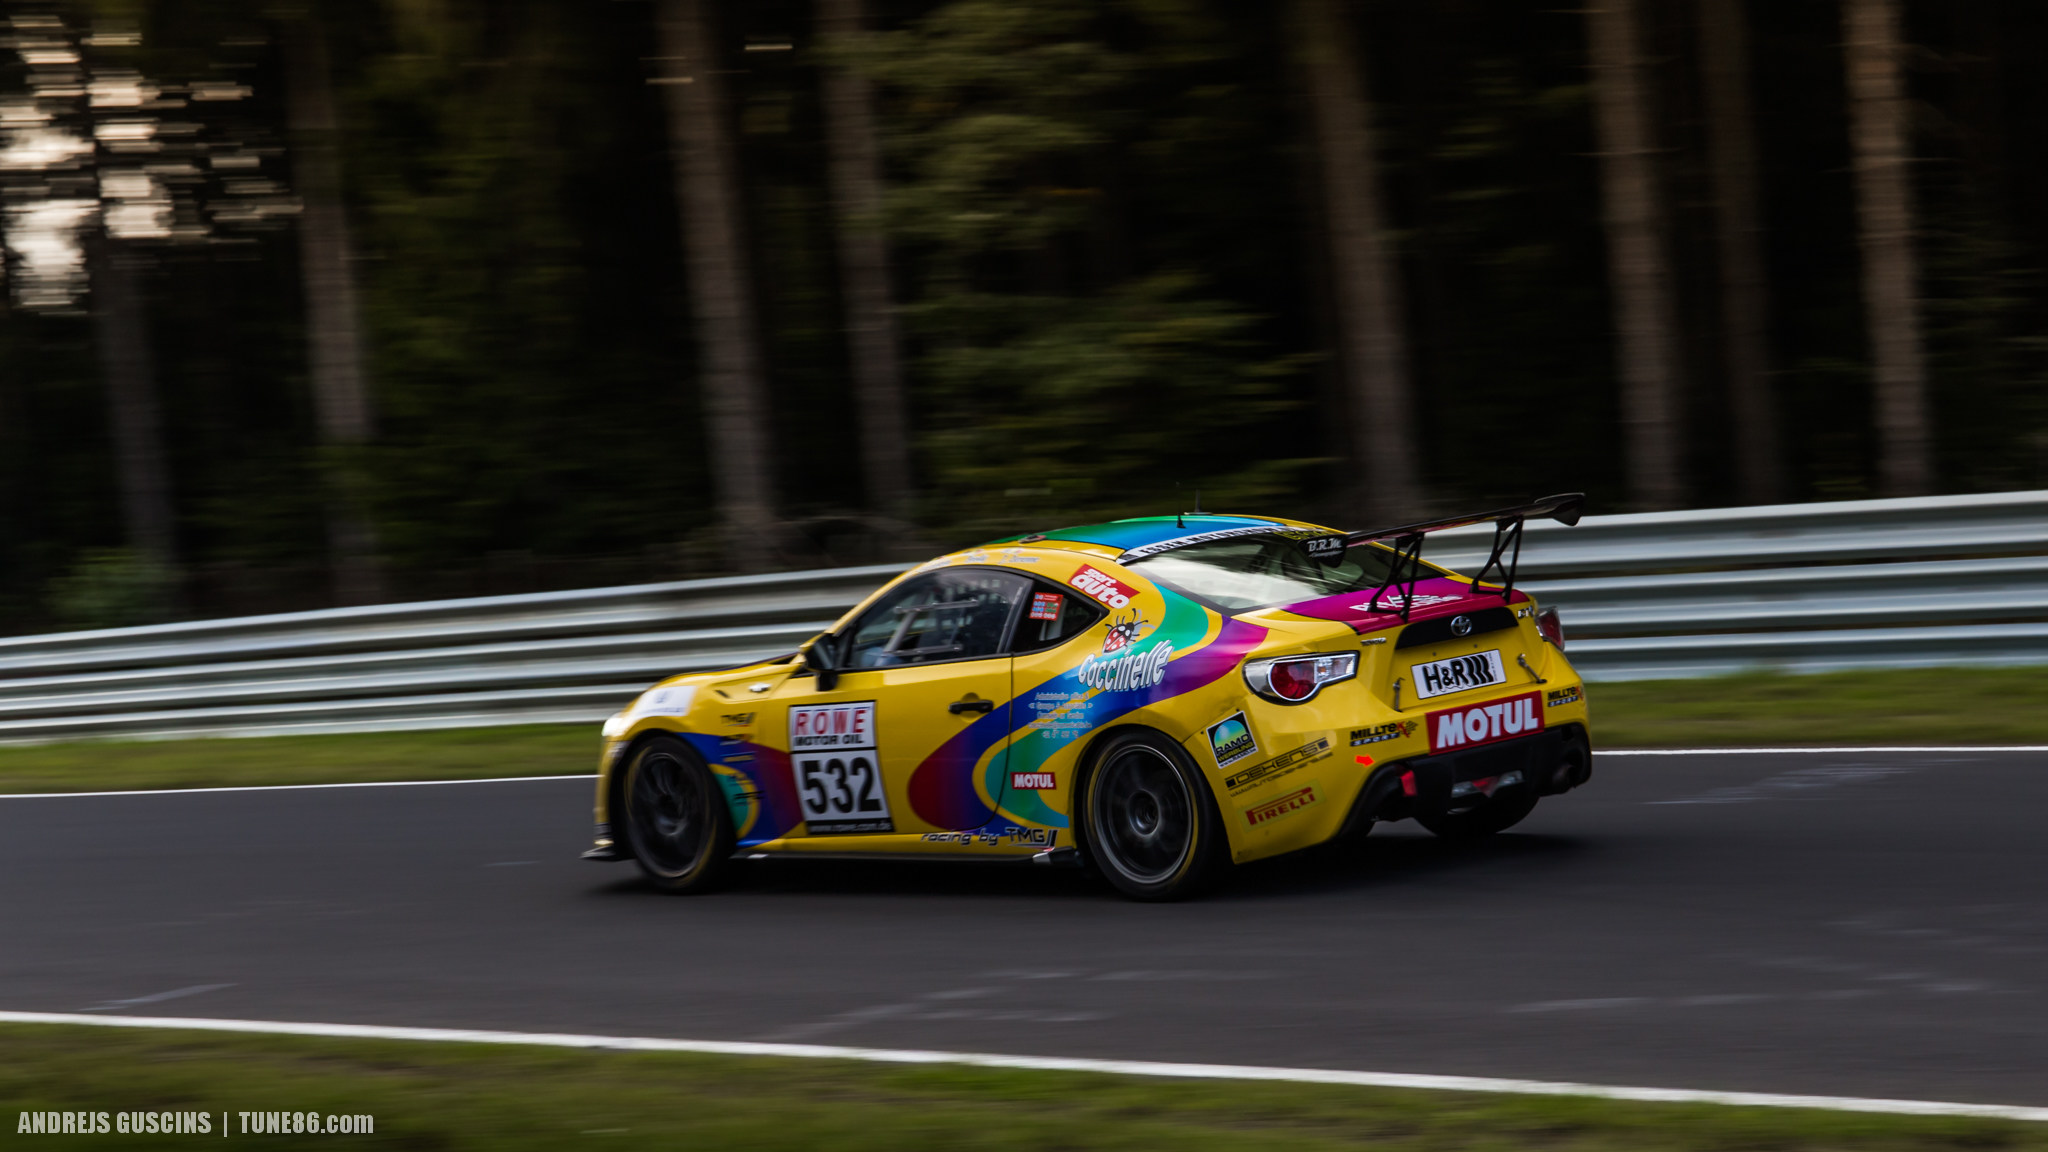 2013 Scion Fr S 10 Series >> Photo: Tune86 Nurburgring Vln 7 Andrejs Guscins Toyota86 56 | TUNE86